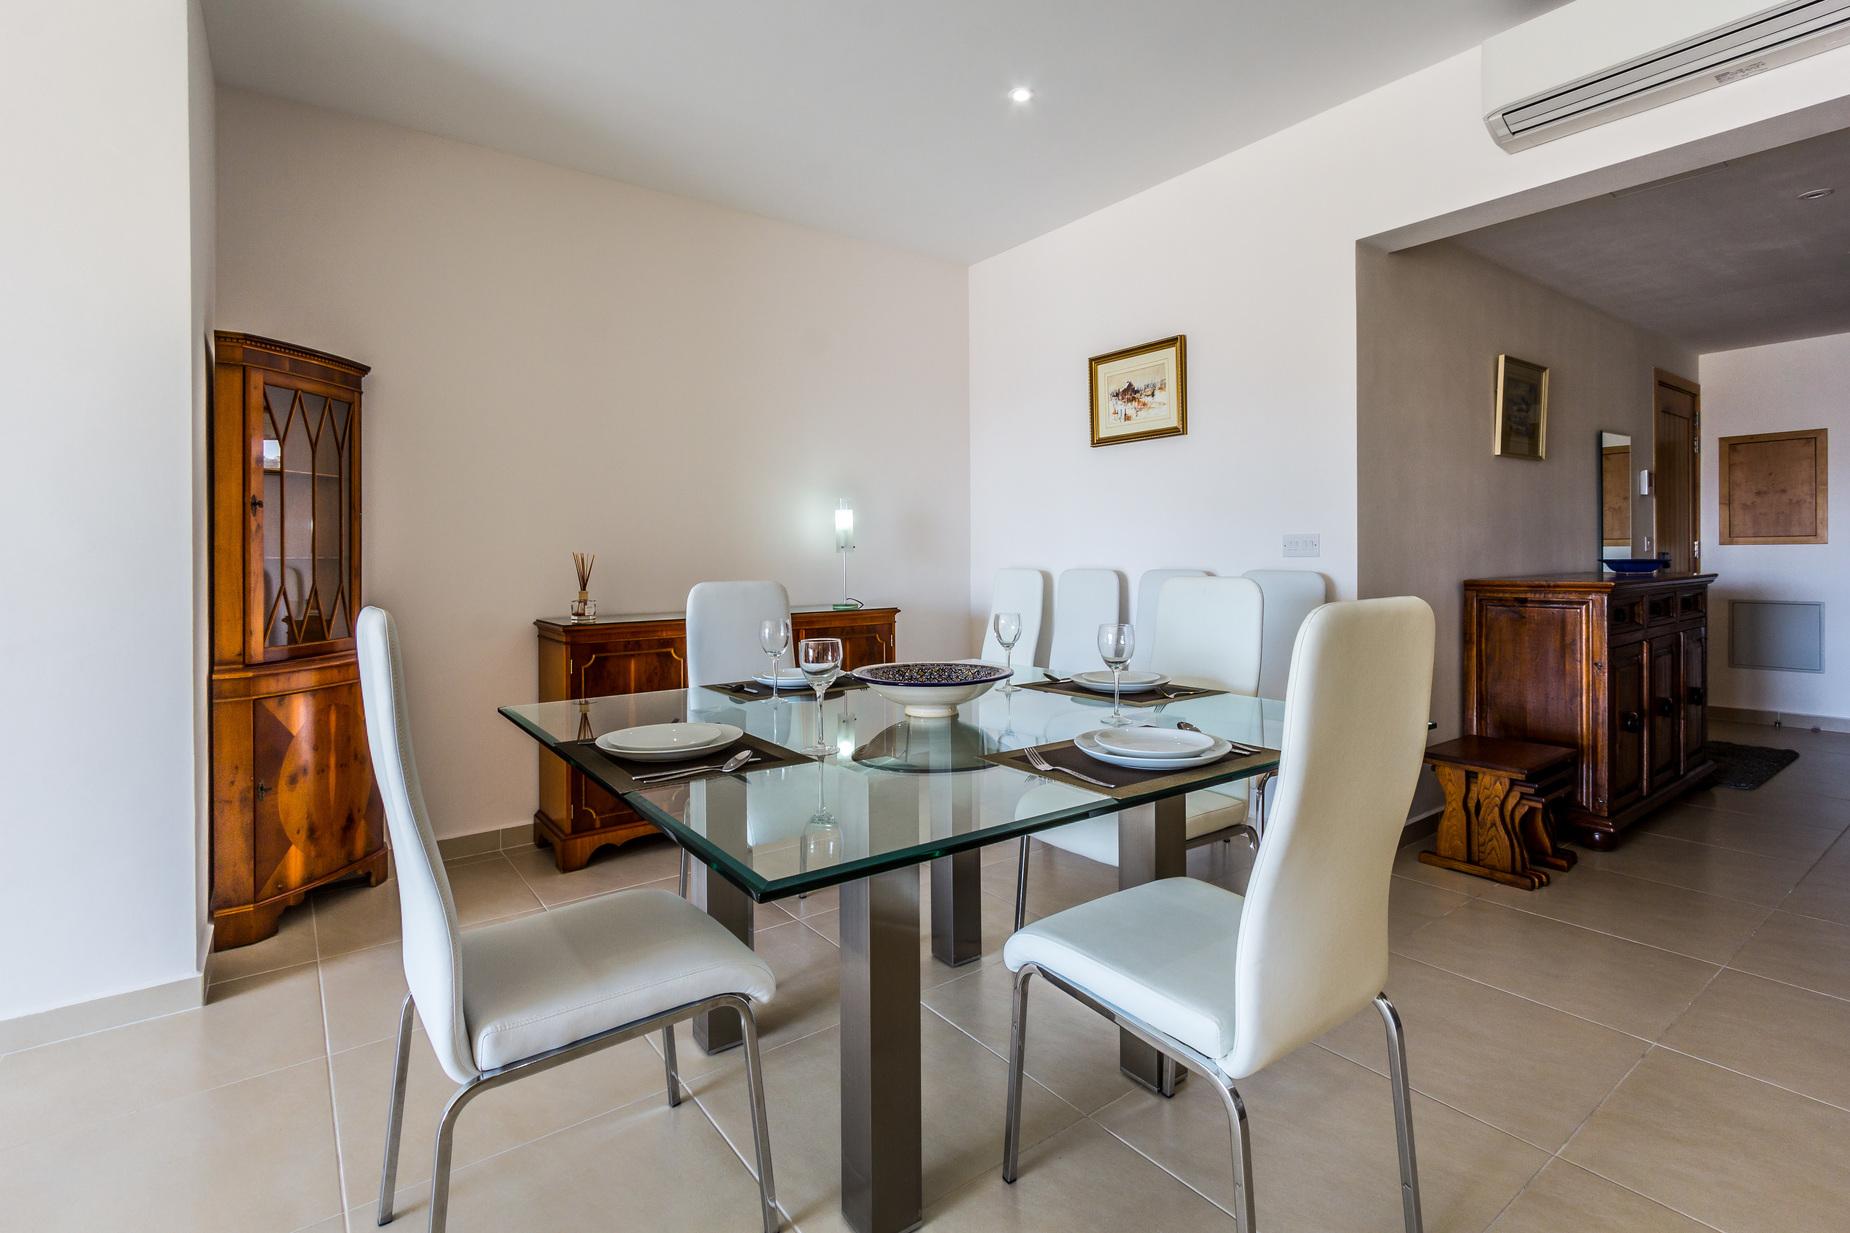 2 bed Apartment For Rent in Marsascala, Marsascala - thumb 3